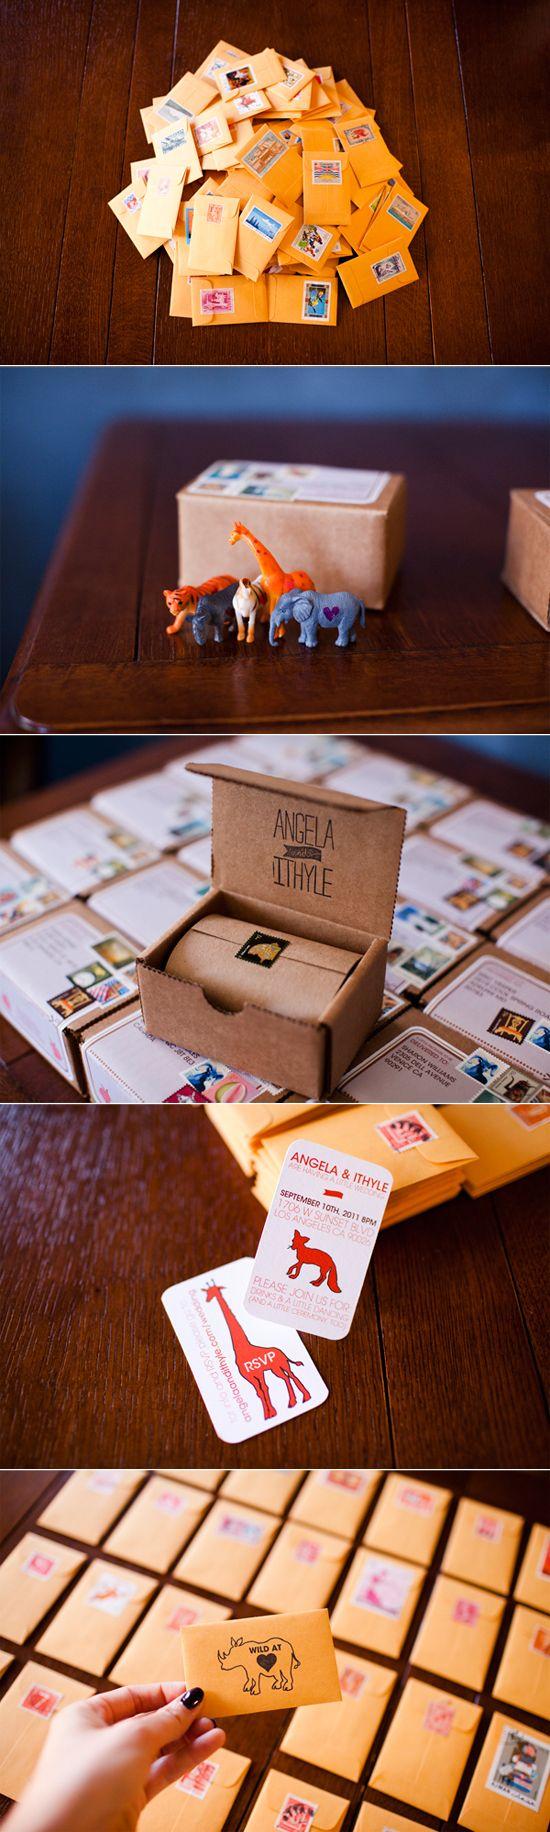 super creative invitations: Design Inspiration, Heart Wedding Invitations, Some People, Creative Birthday Cards, Packaging Design, Creative Invitations, Cards Wedding, Wild At Heart, Creative Wedding Invitations